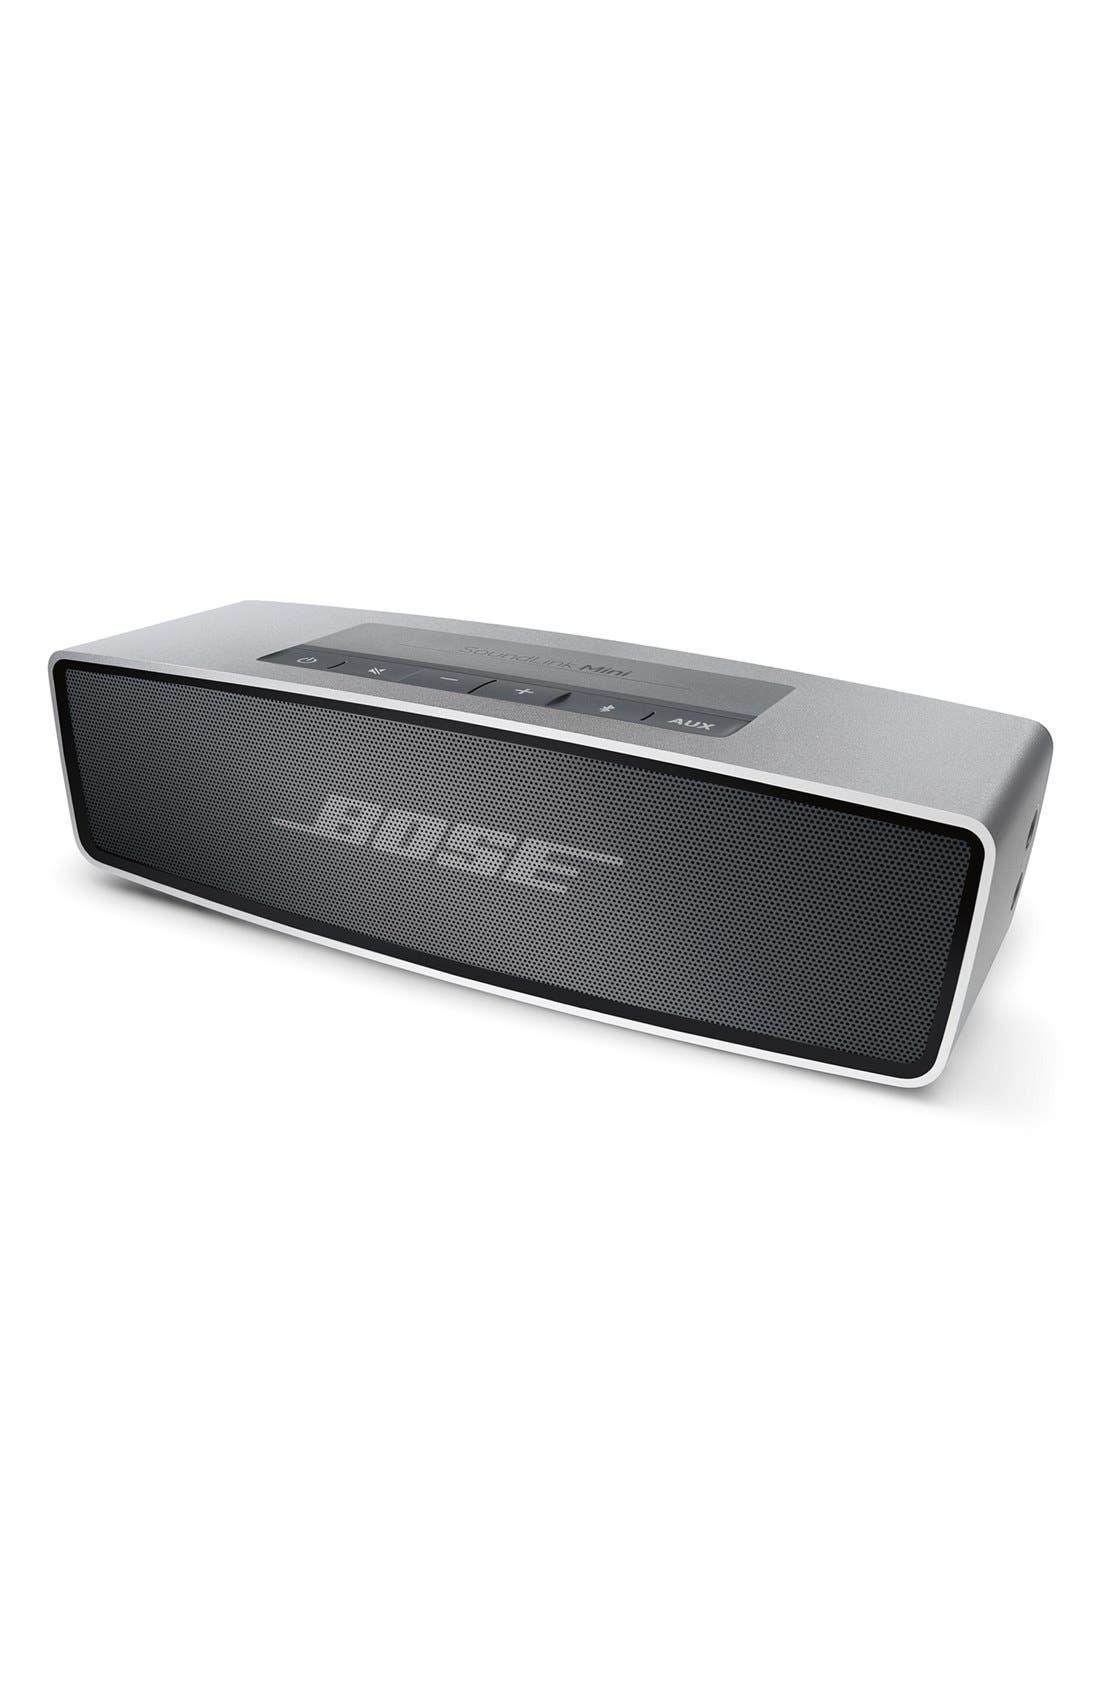 Main Image - Bose® SoundLink® Mini Bluetooth® Speaker